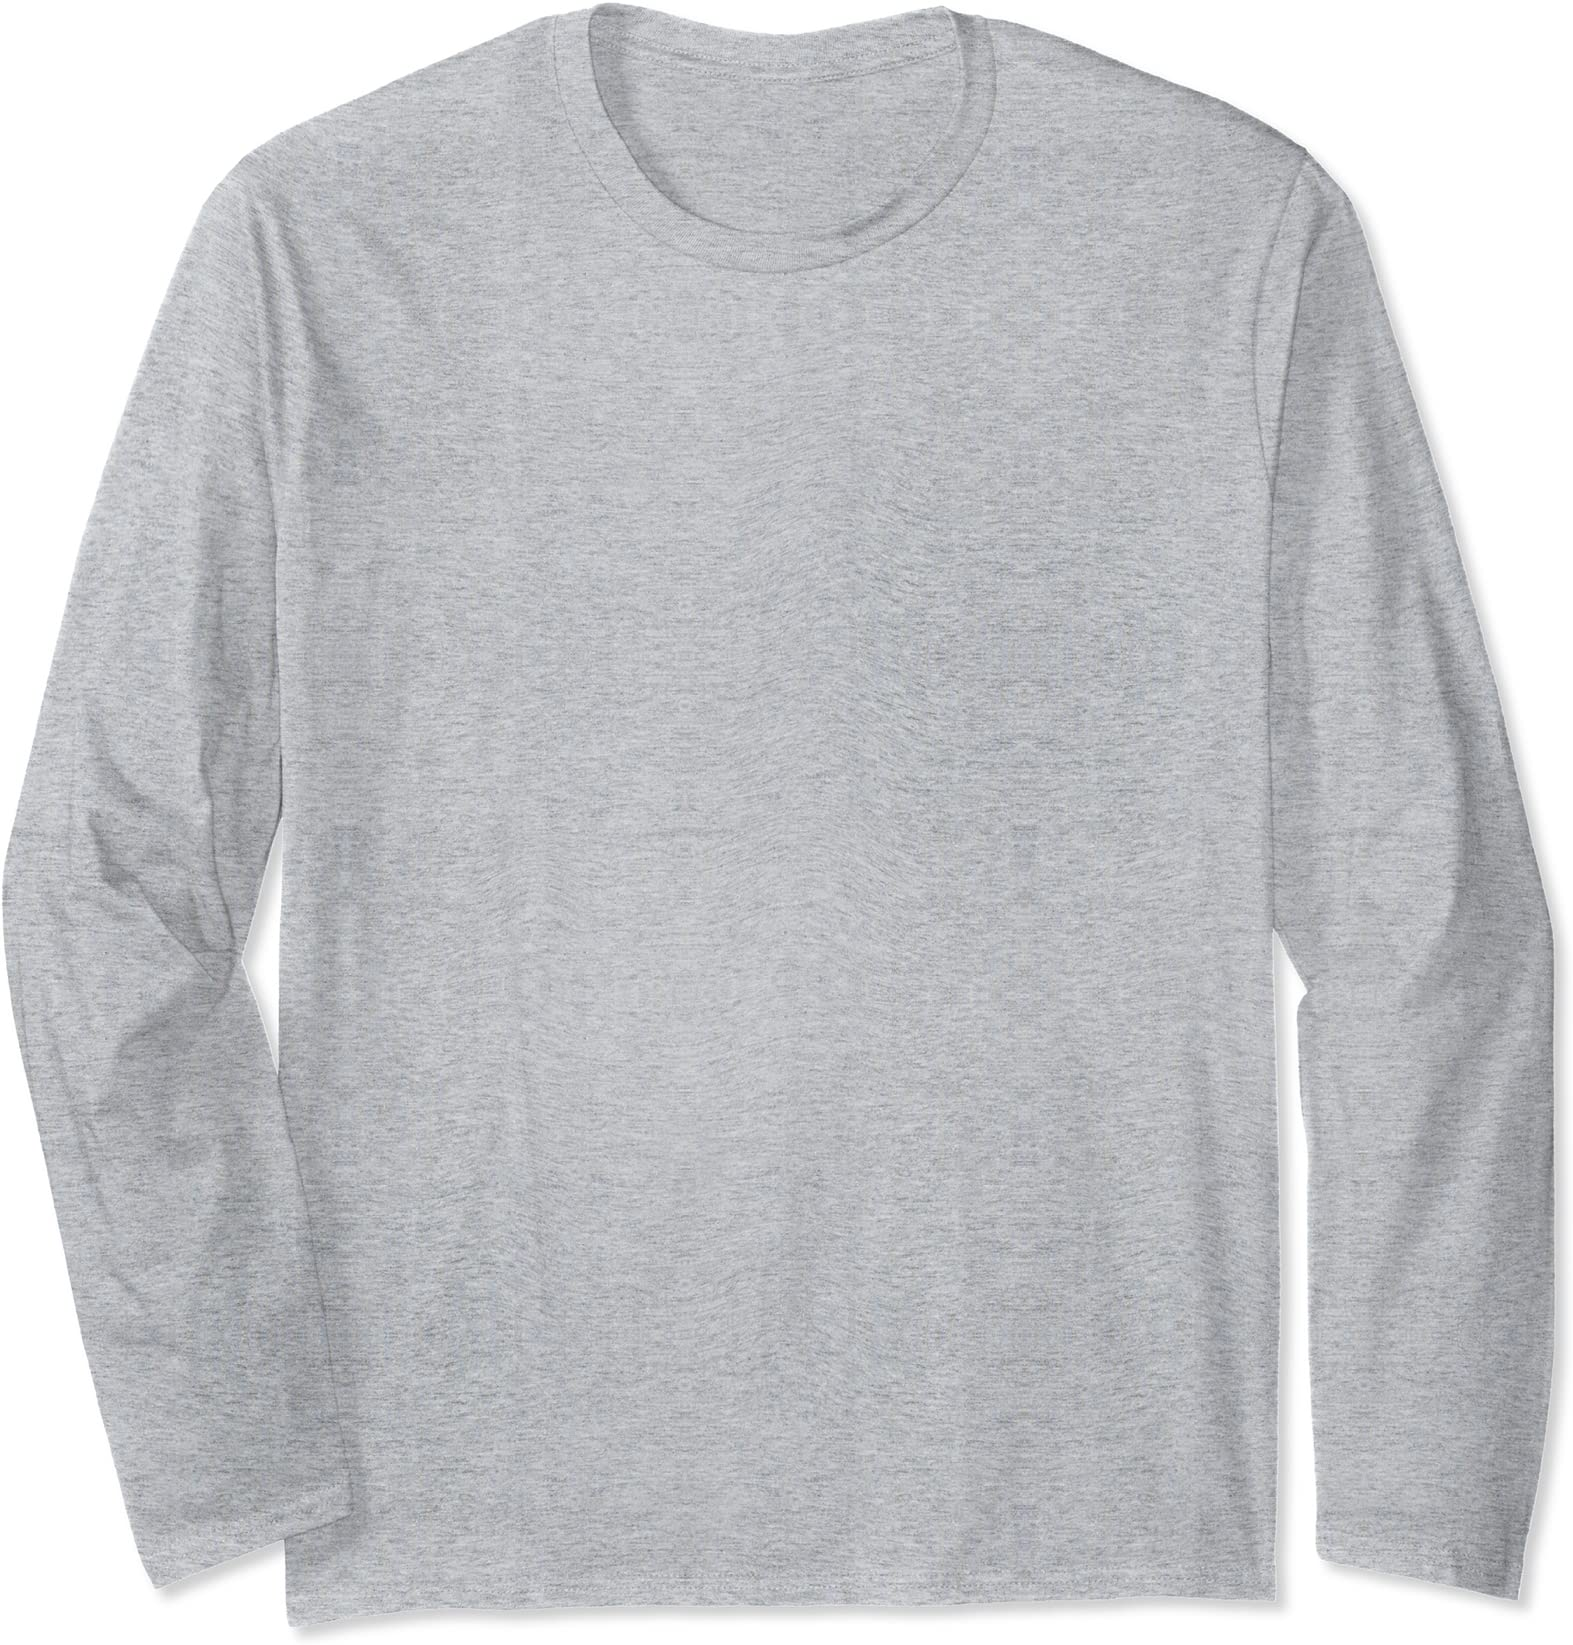 Welsh Flag Distressed Black Adult Long Sleeve T-Shirt